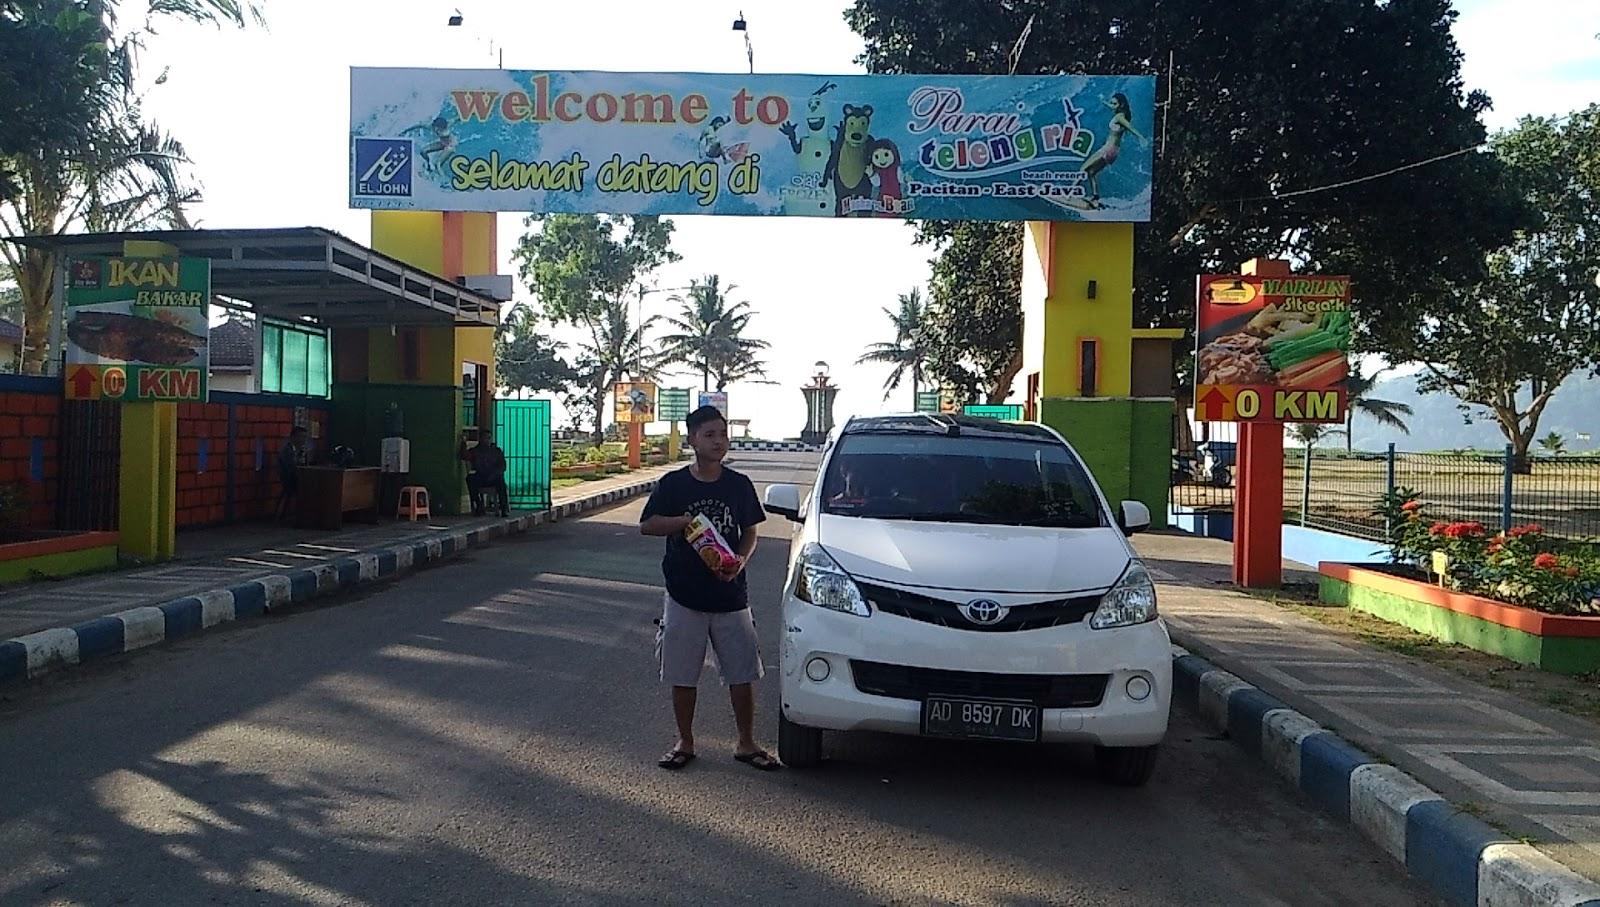 Pantai Teleng Ria Pacitan Jawa Timur Jelajah Nusantara Salah Satu